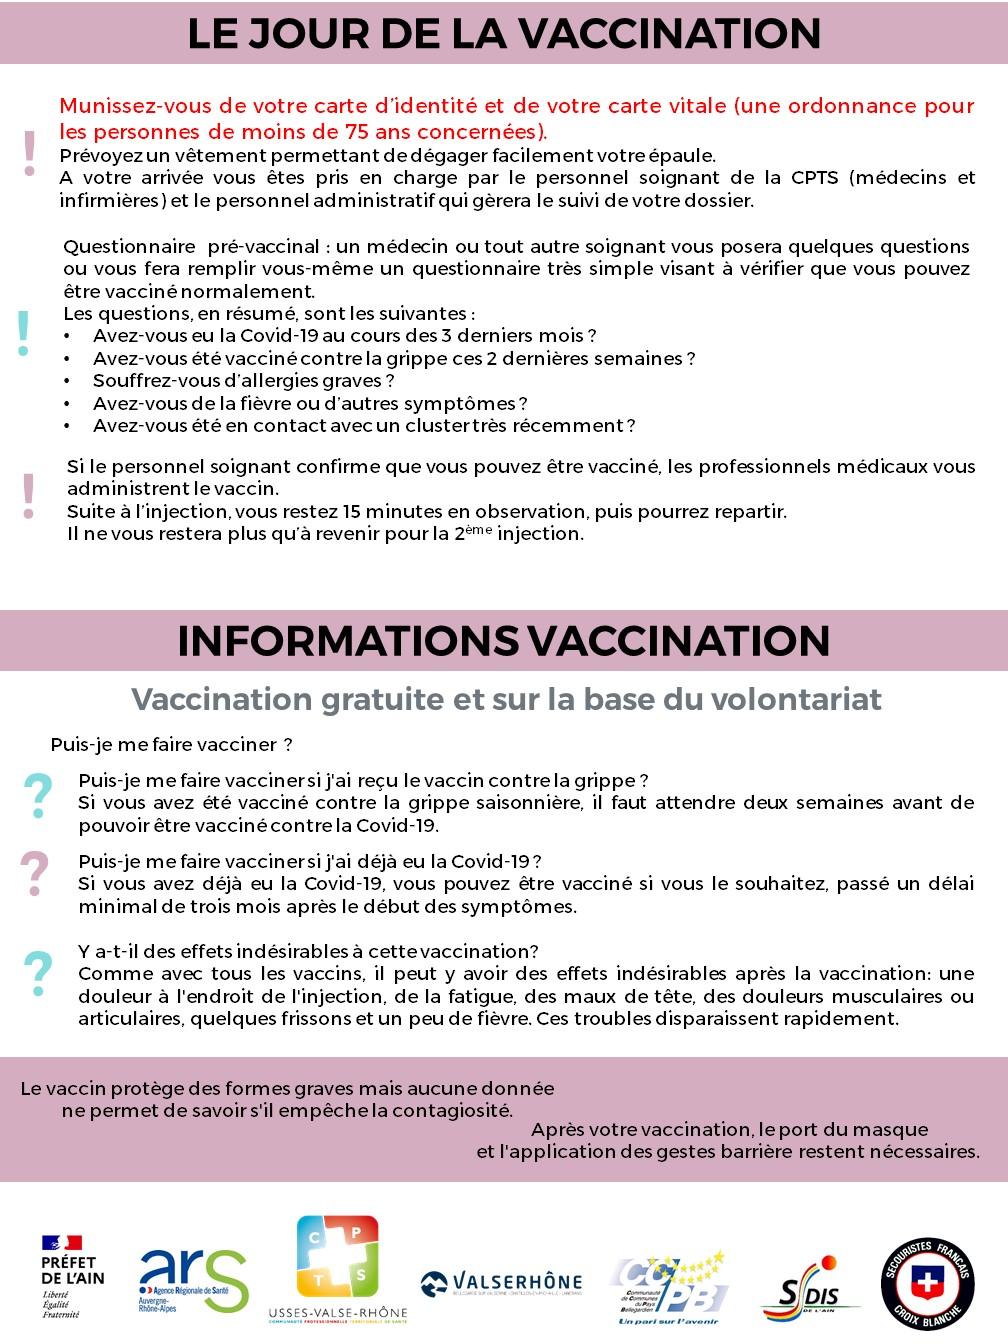 Vaccination Valserhône